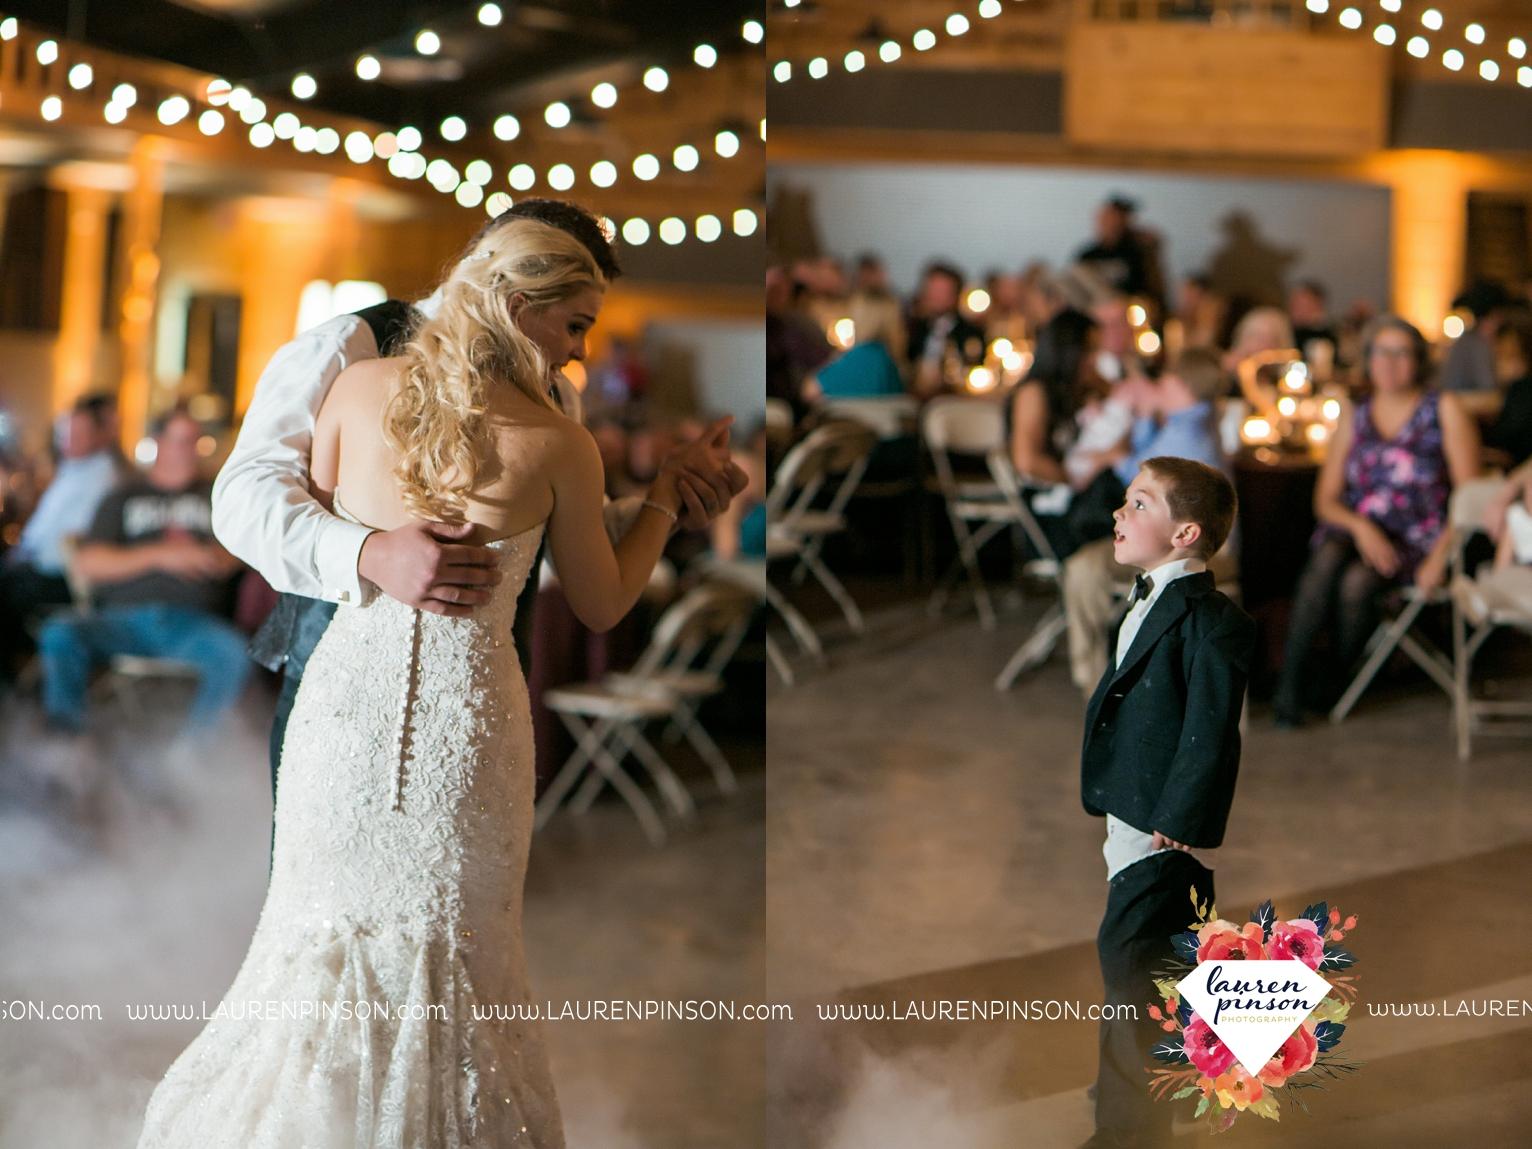 rustic-wichita-falls-texas-wedding-photographer-gold-glam-mayfield-events-market-street-united-allue-bridals-fall_1784.jpg